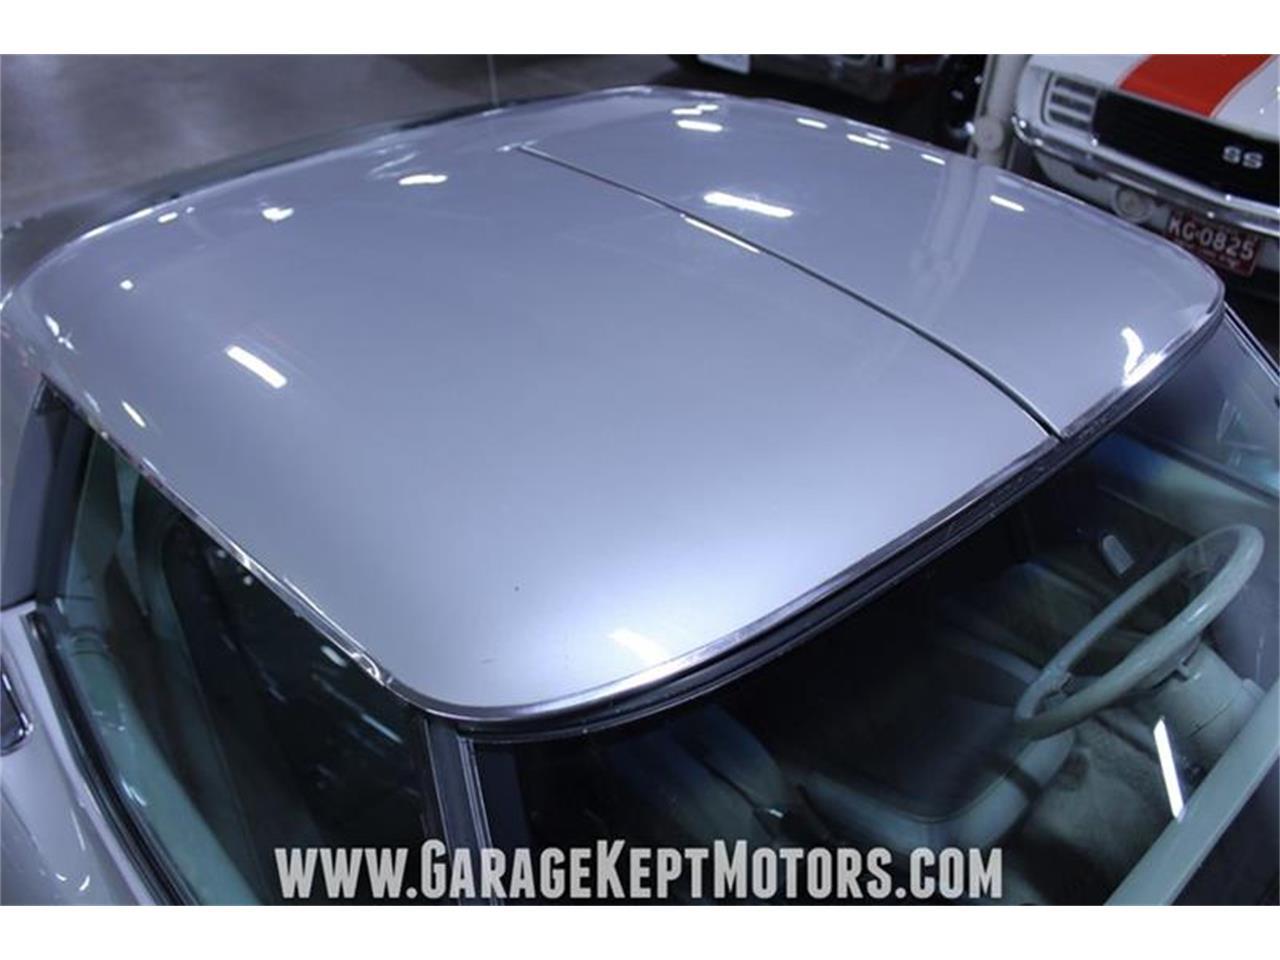 Large Picture of 1978 Chevrolet Corvette located in Michigan - $10,900.00 - PWXN